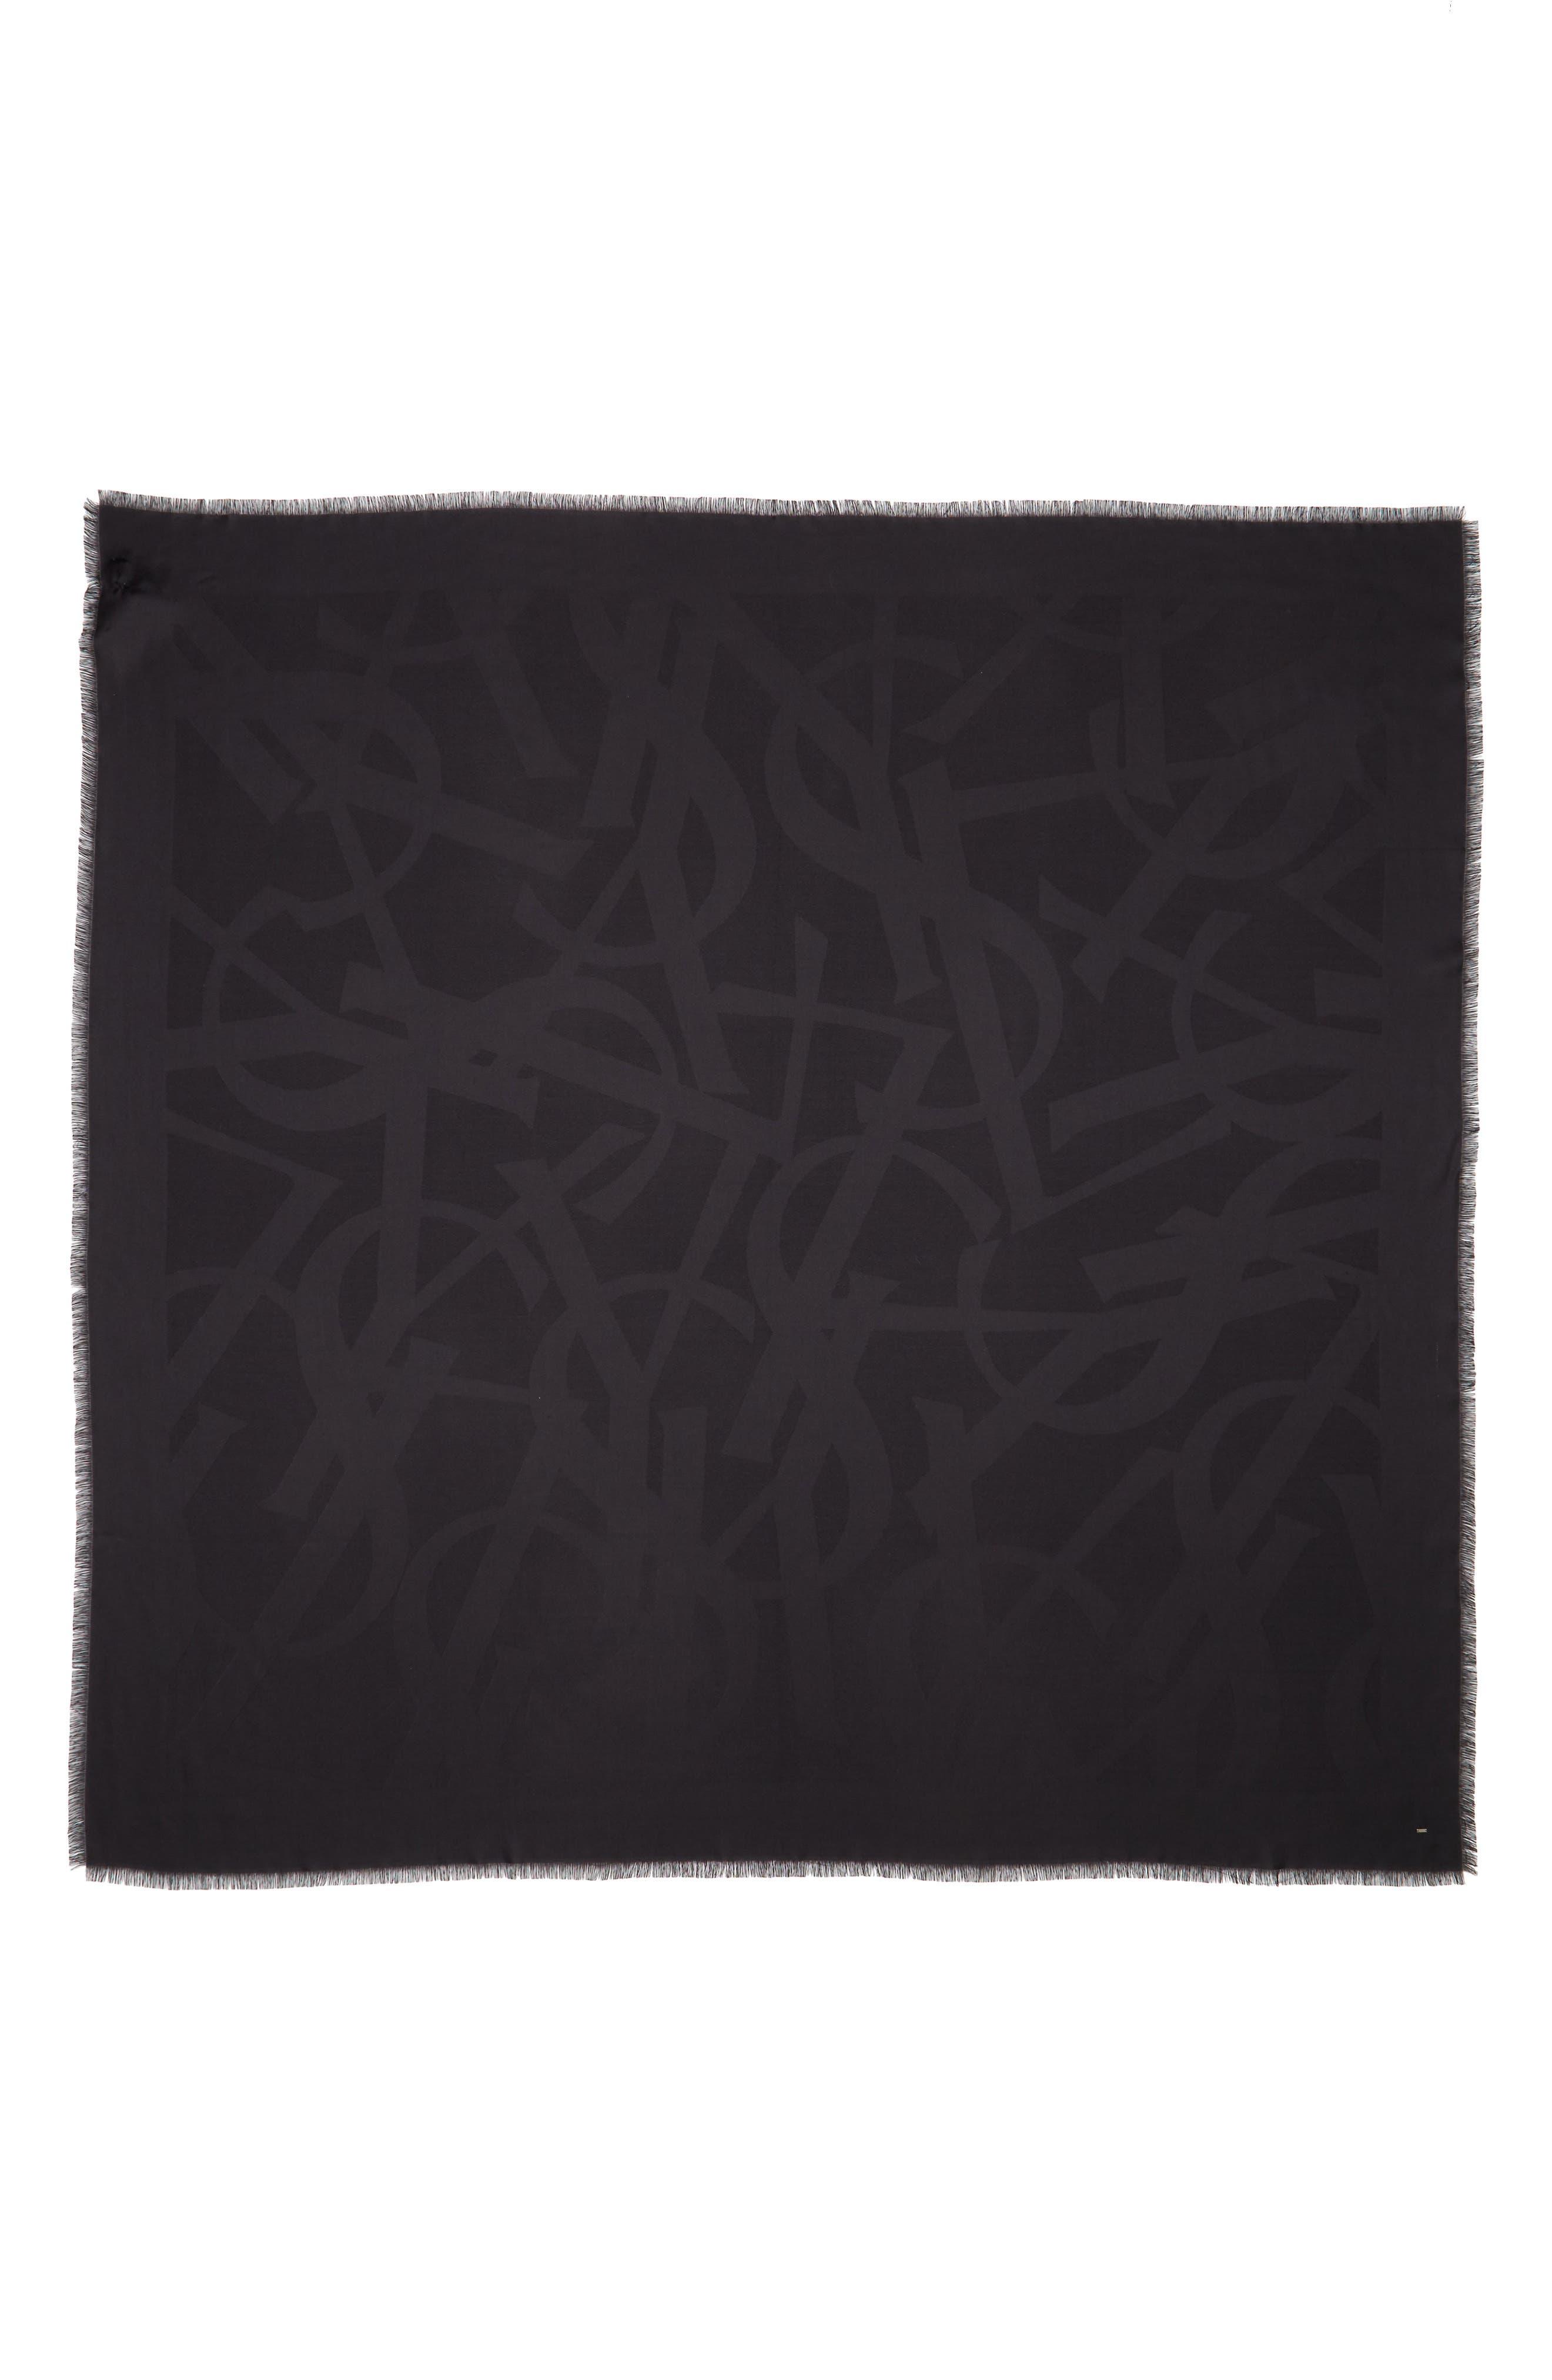 YSL Random Logo Jacquard Square Silk Scarf,                         Main,                         color, 001